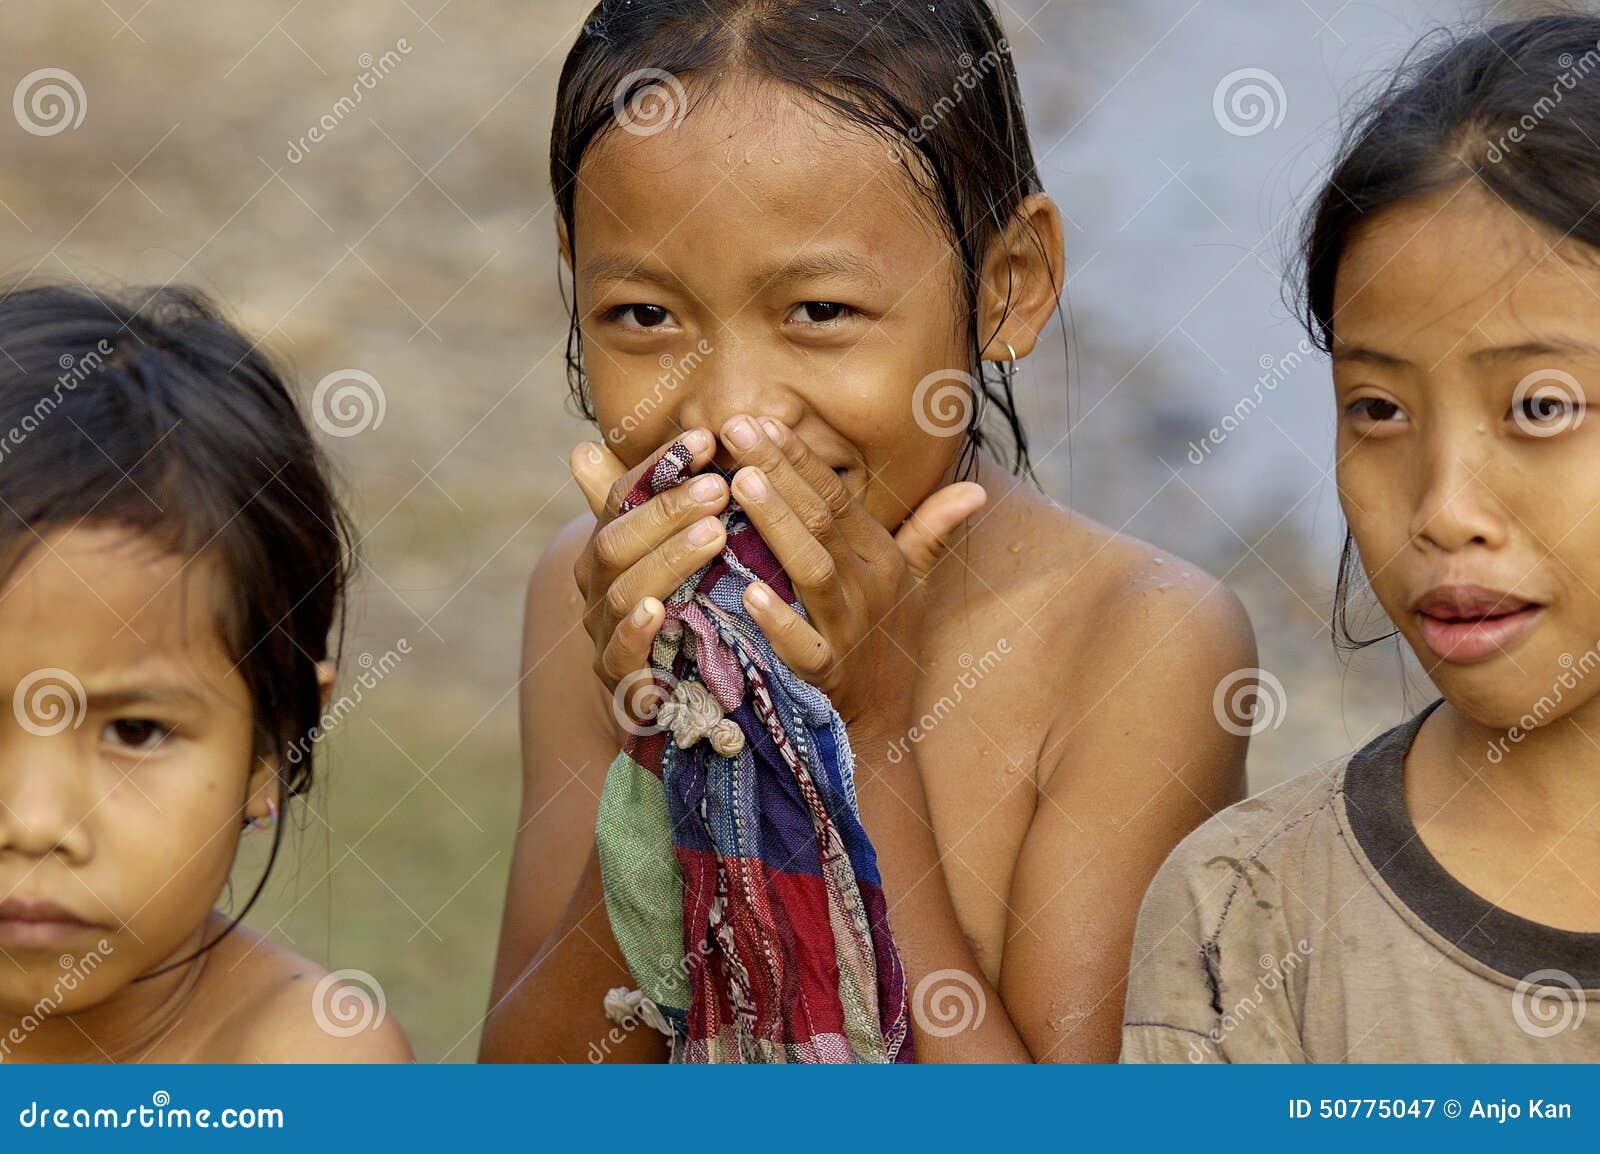 laos naked girl pics